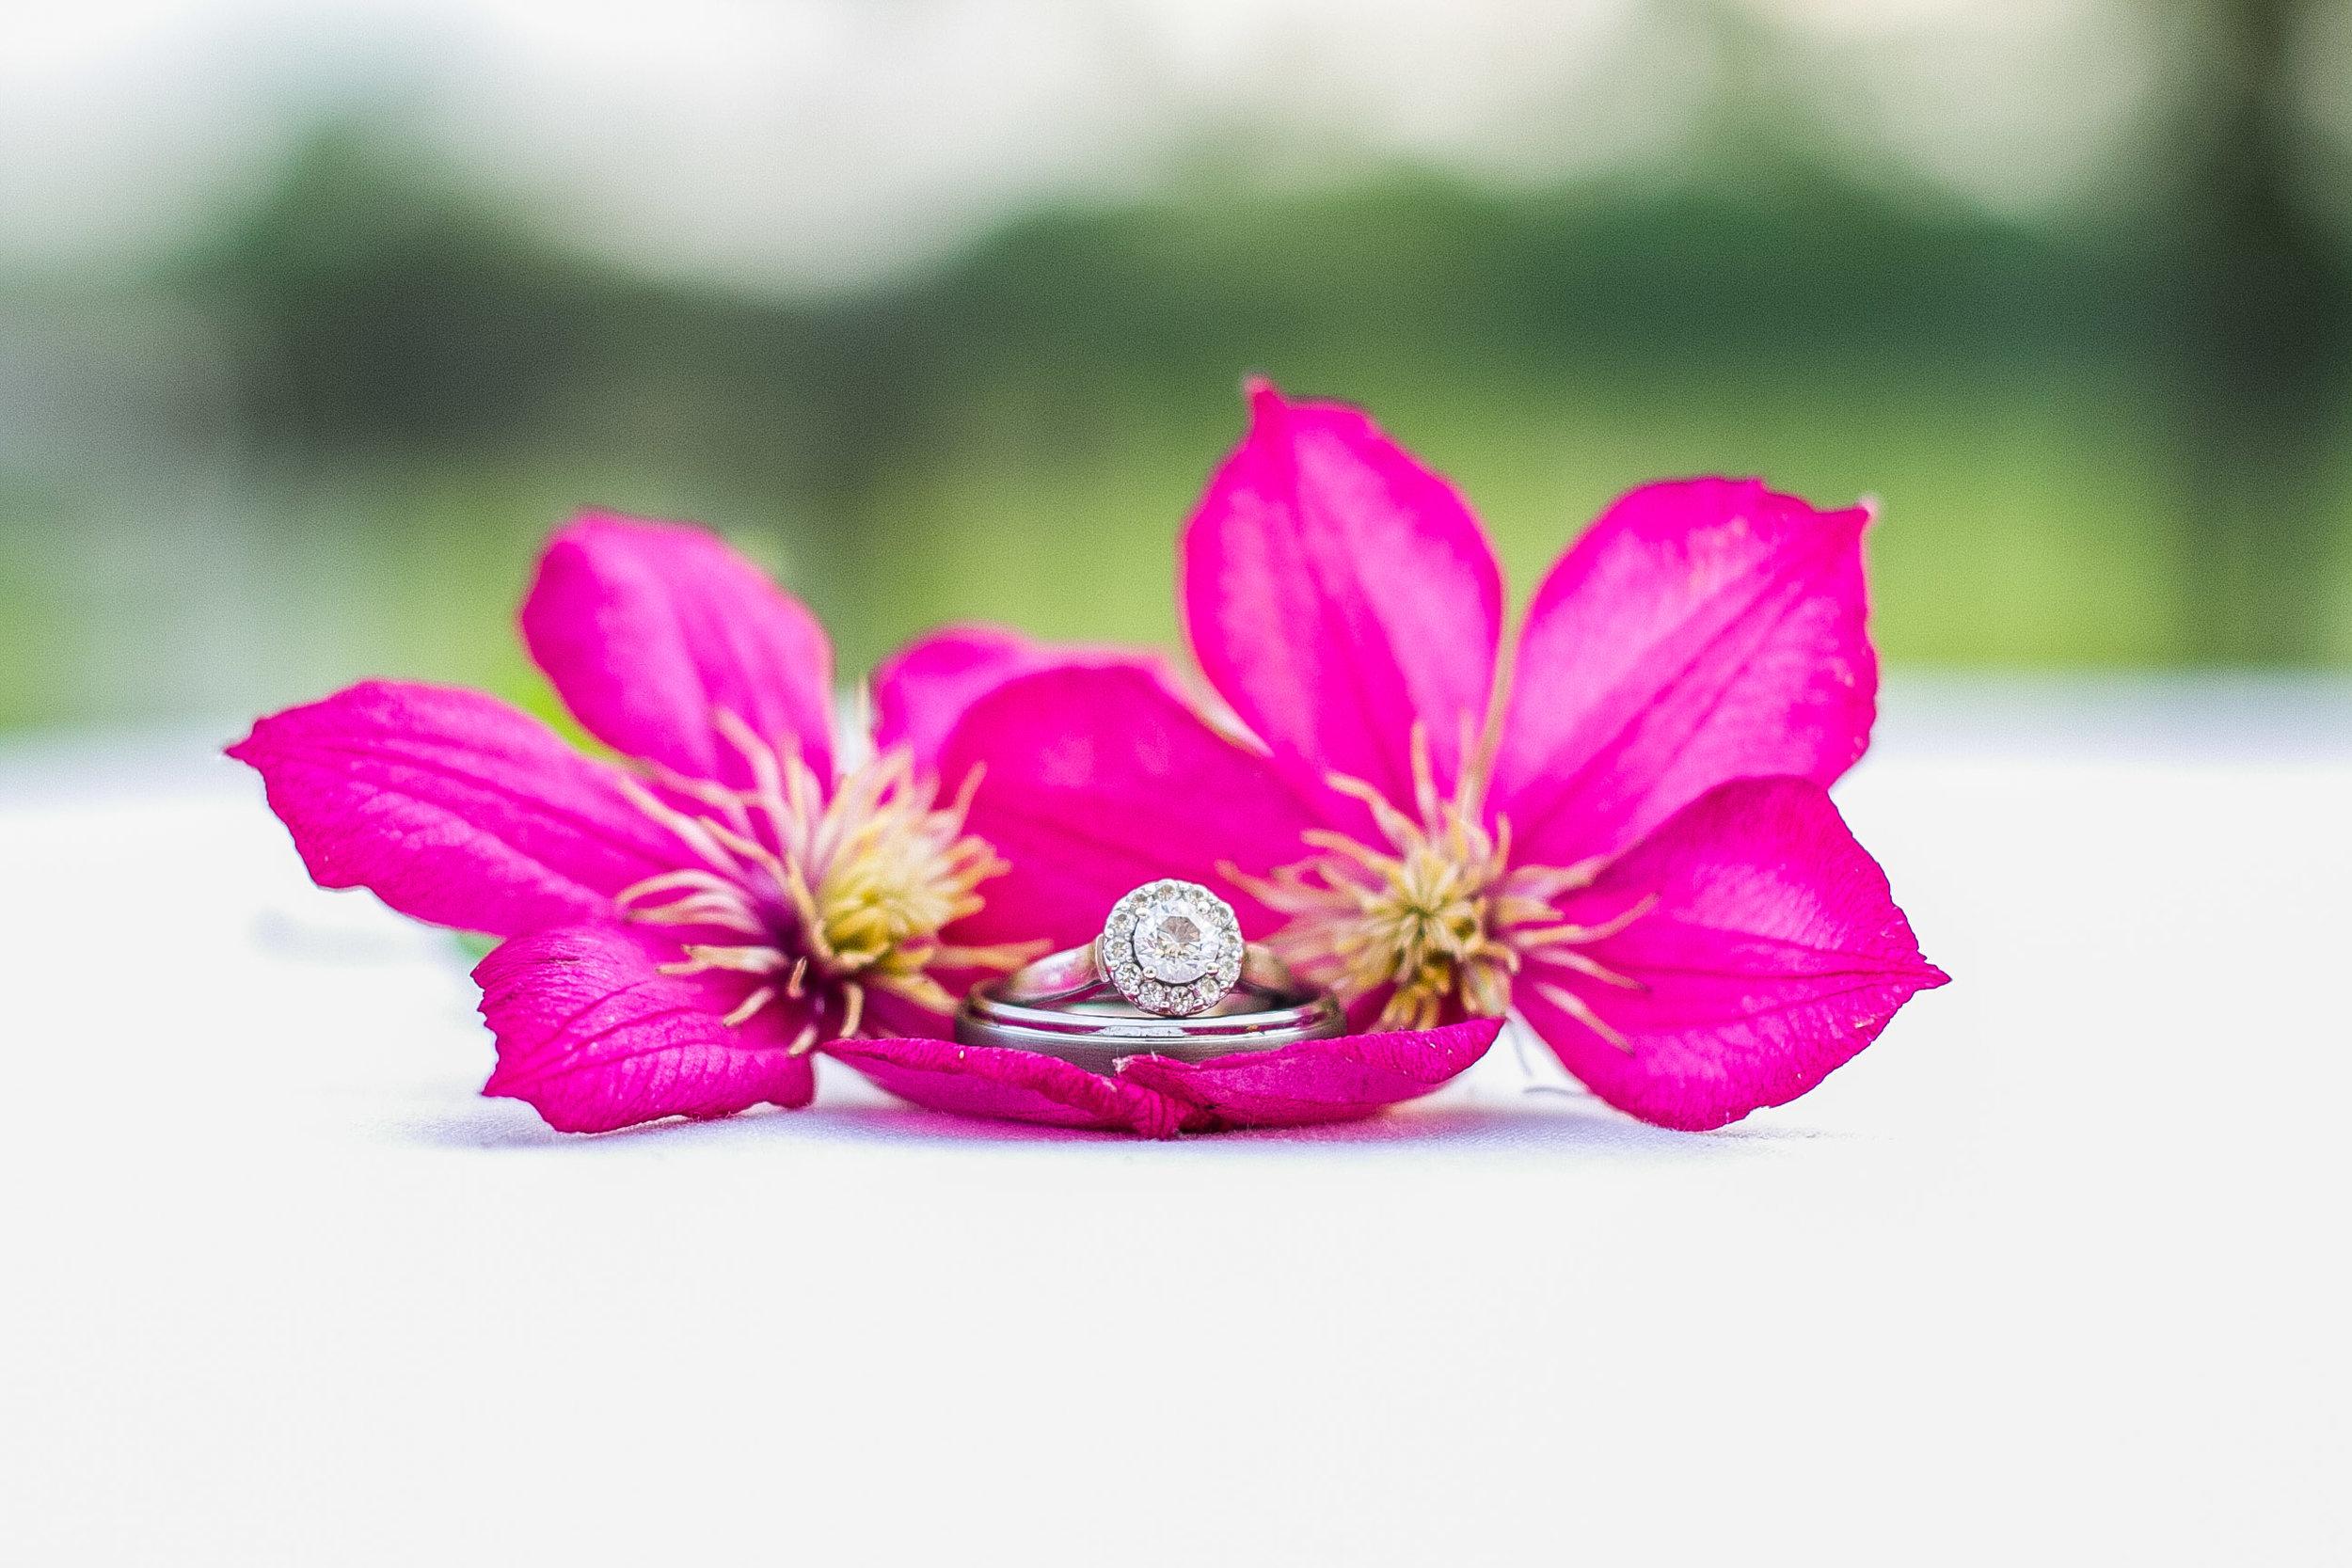 detail shot of wedding rings inside pink flowers